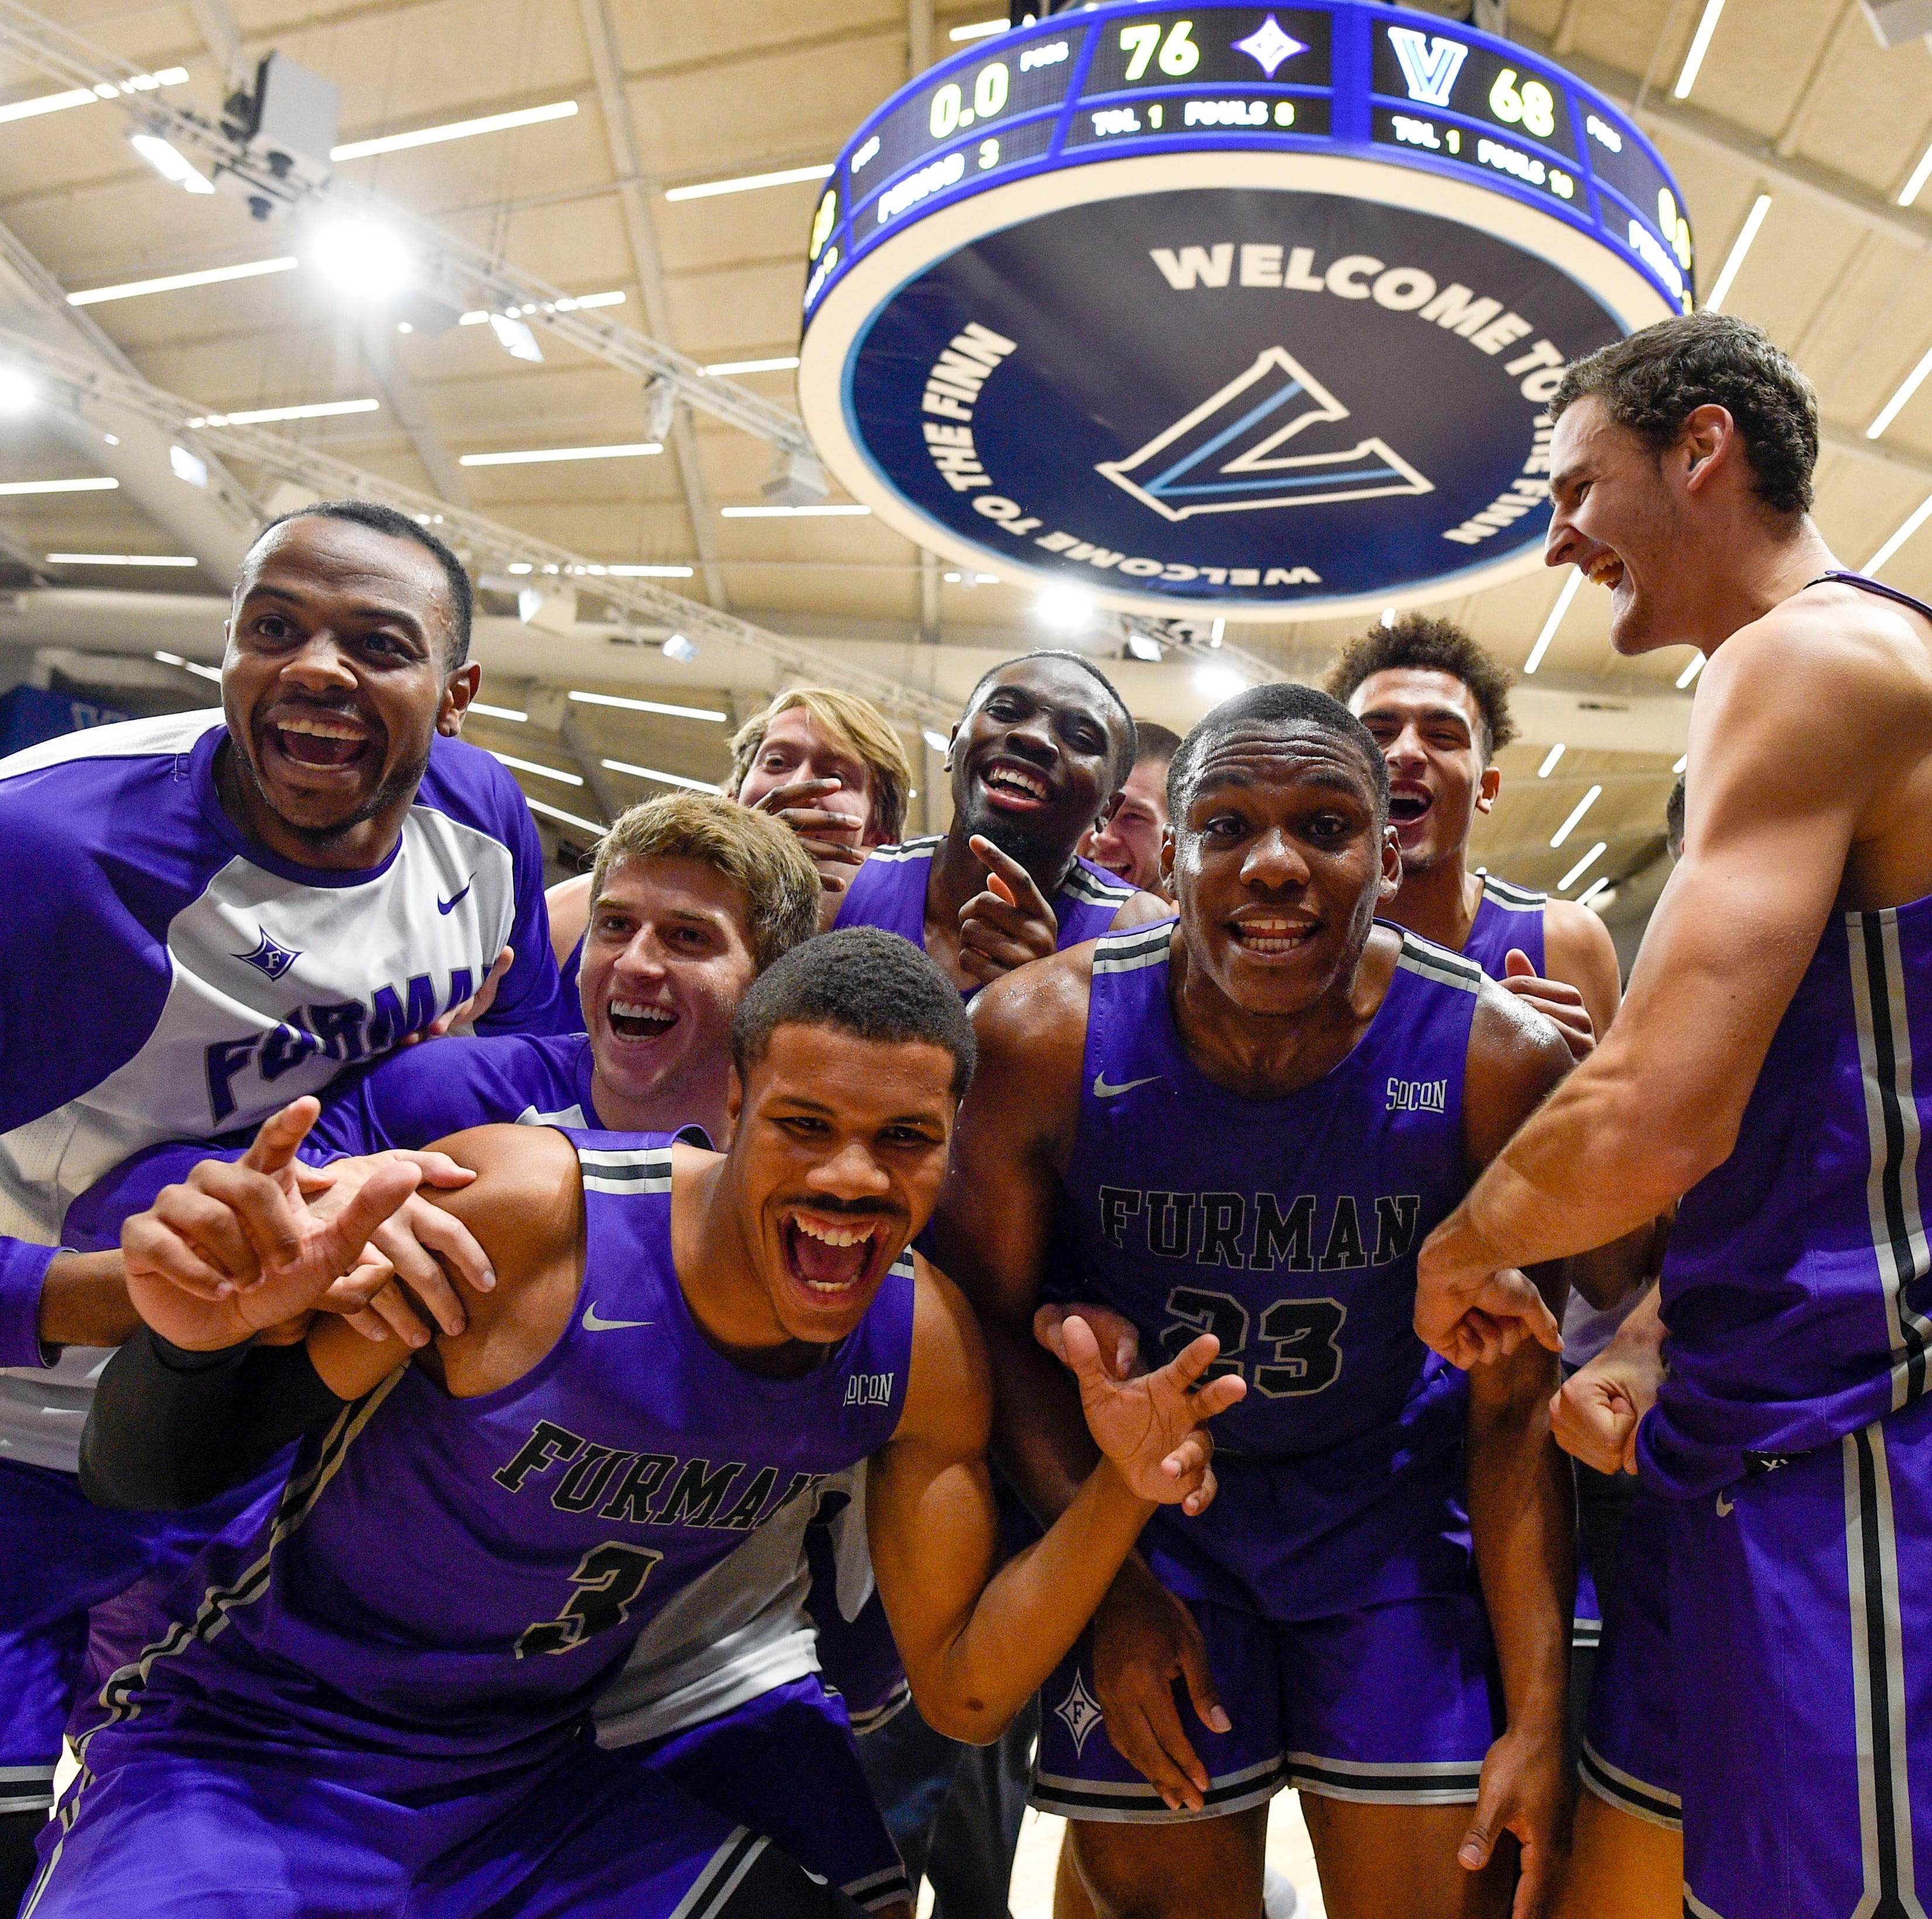 Win over Villanova: Furman men's basketball believes it is onto something special